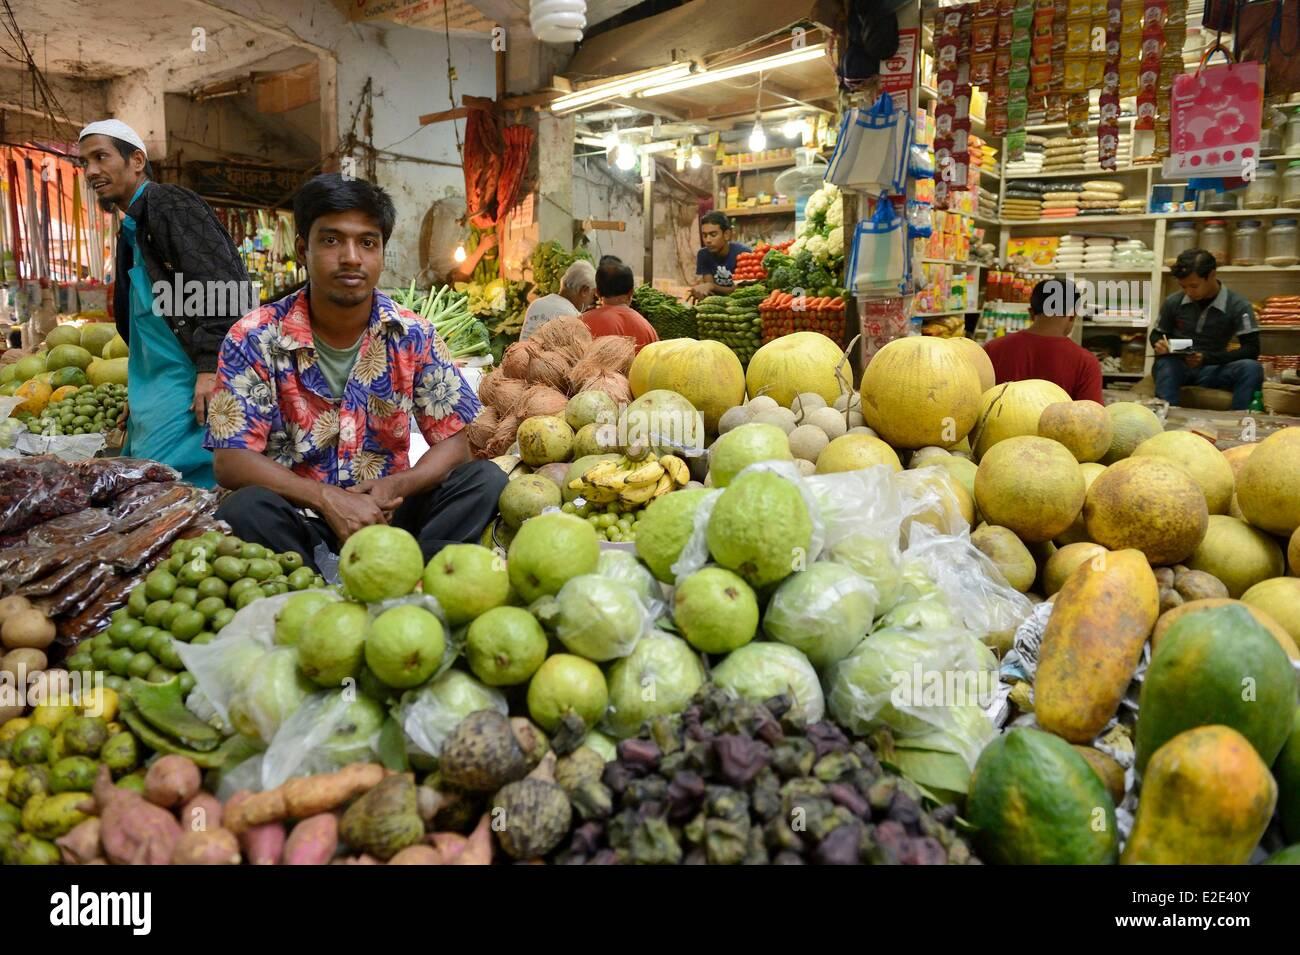 Bangladesh Dhaka (Dacca) market in Gulshan area - Stock Image